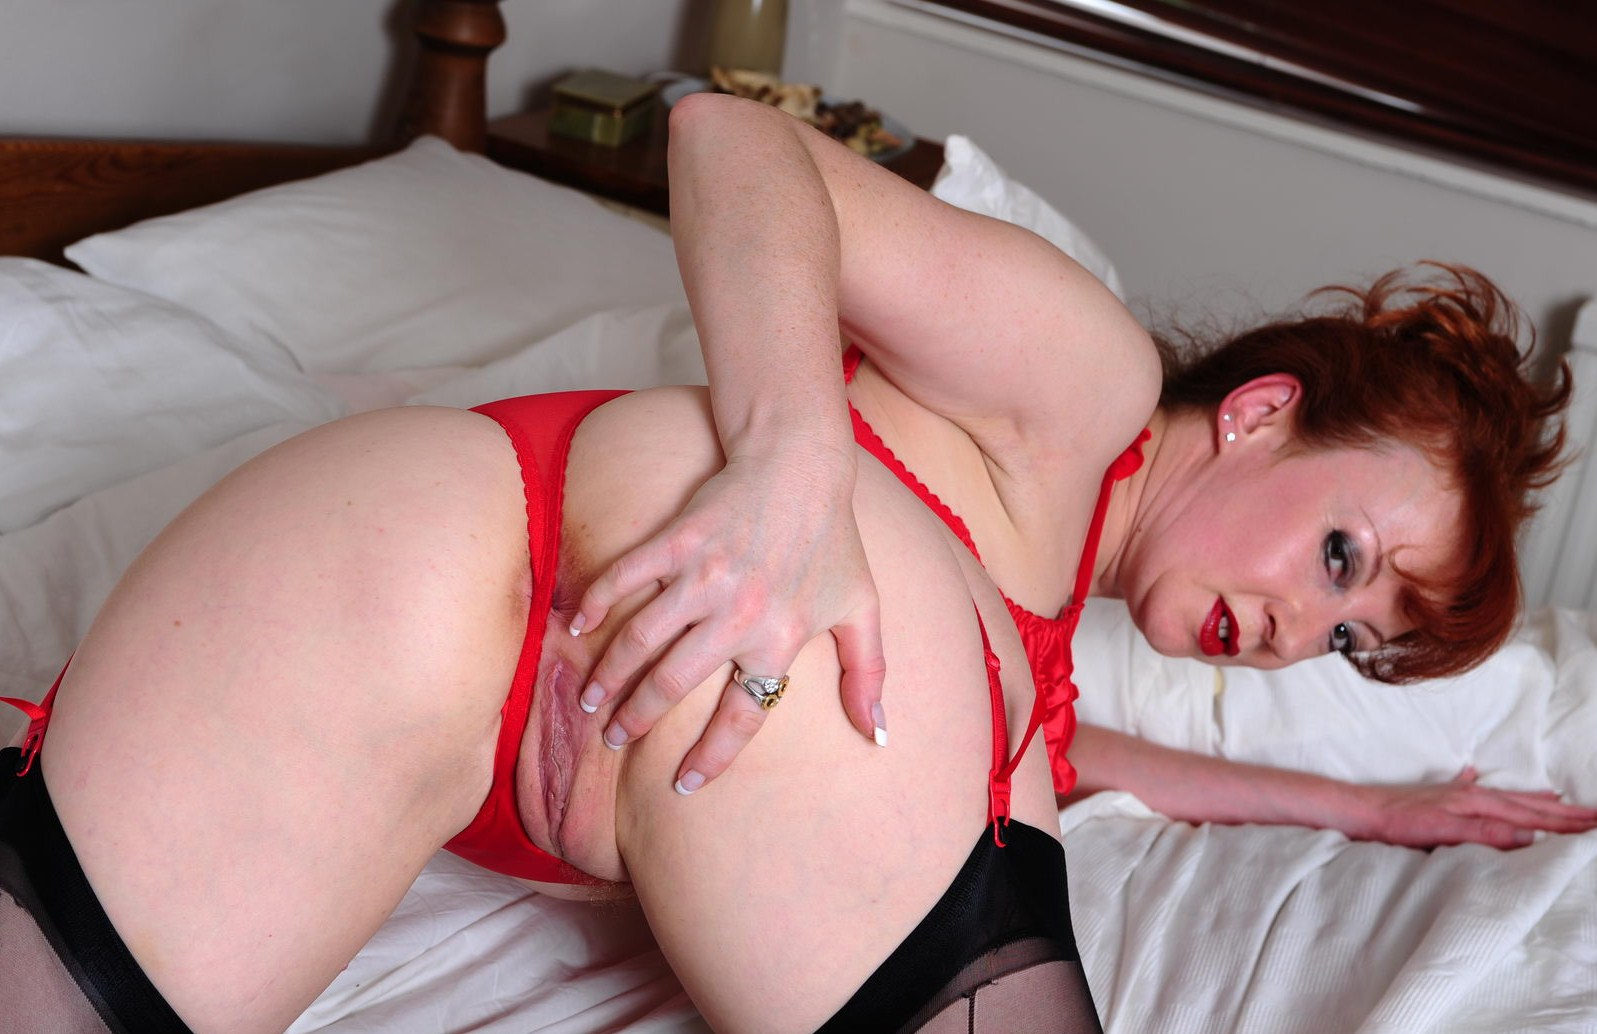 billig erotisk orgasm nära Stockholm